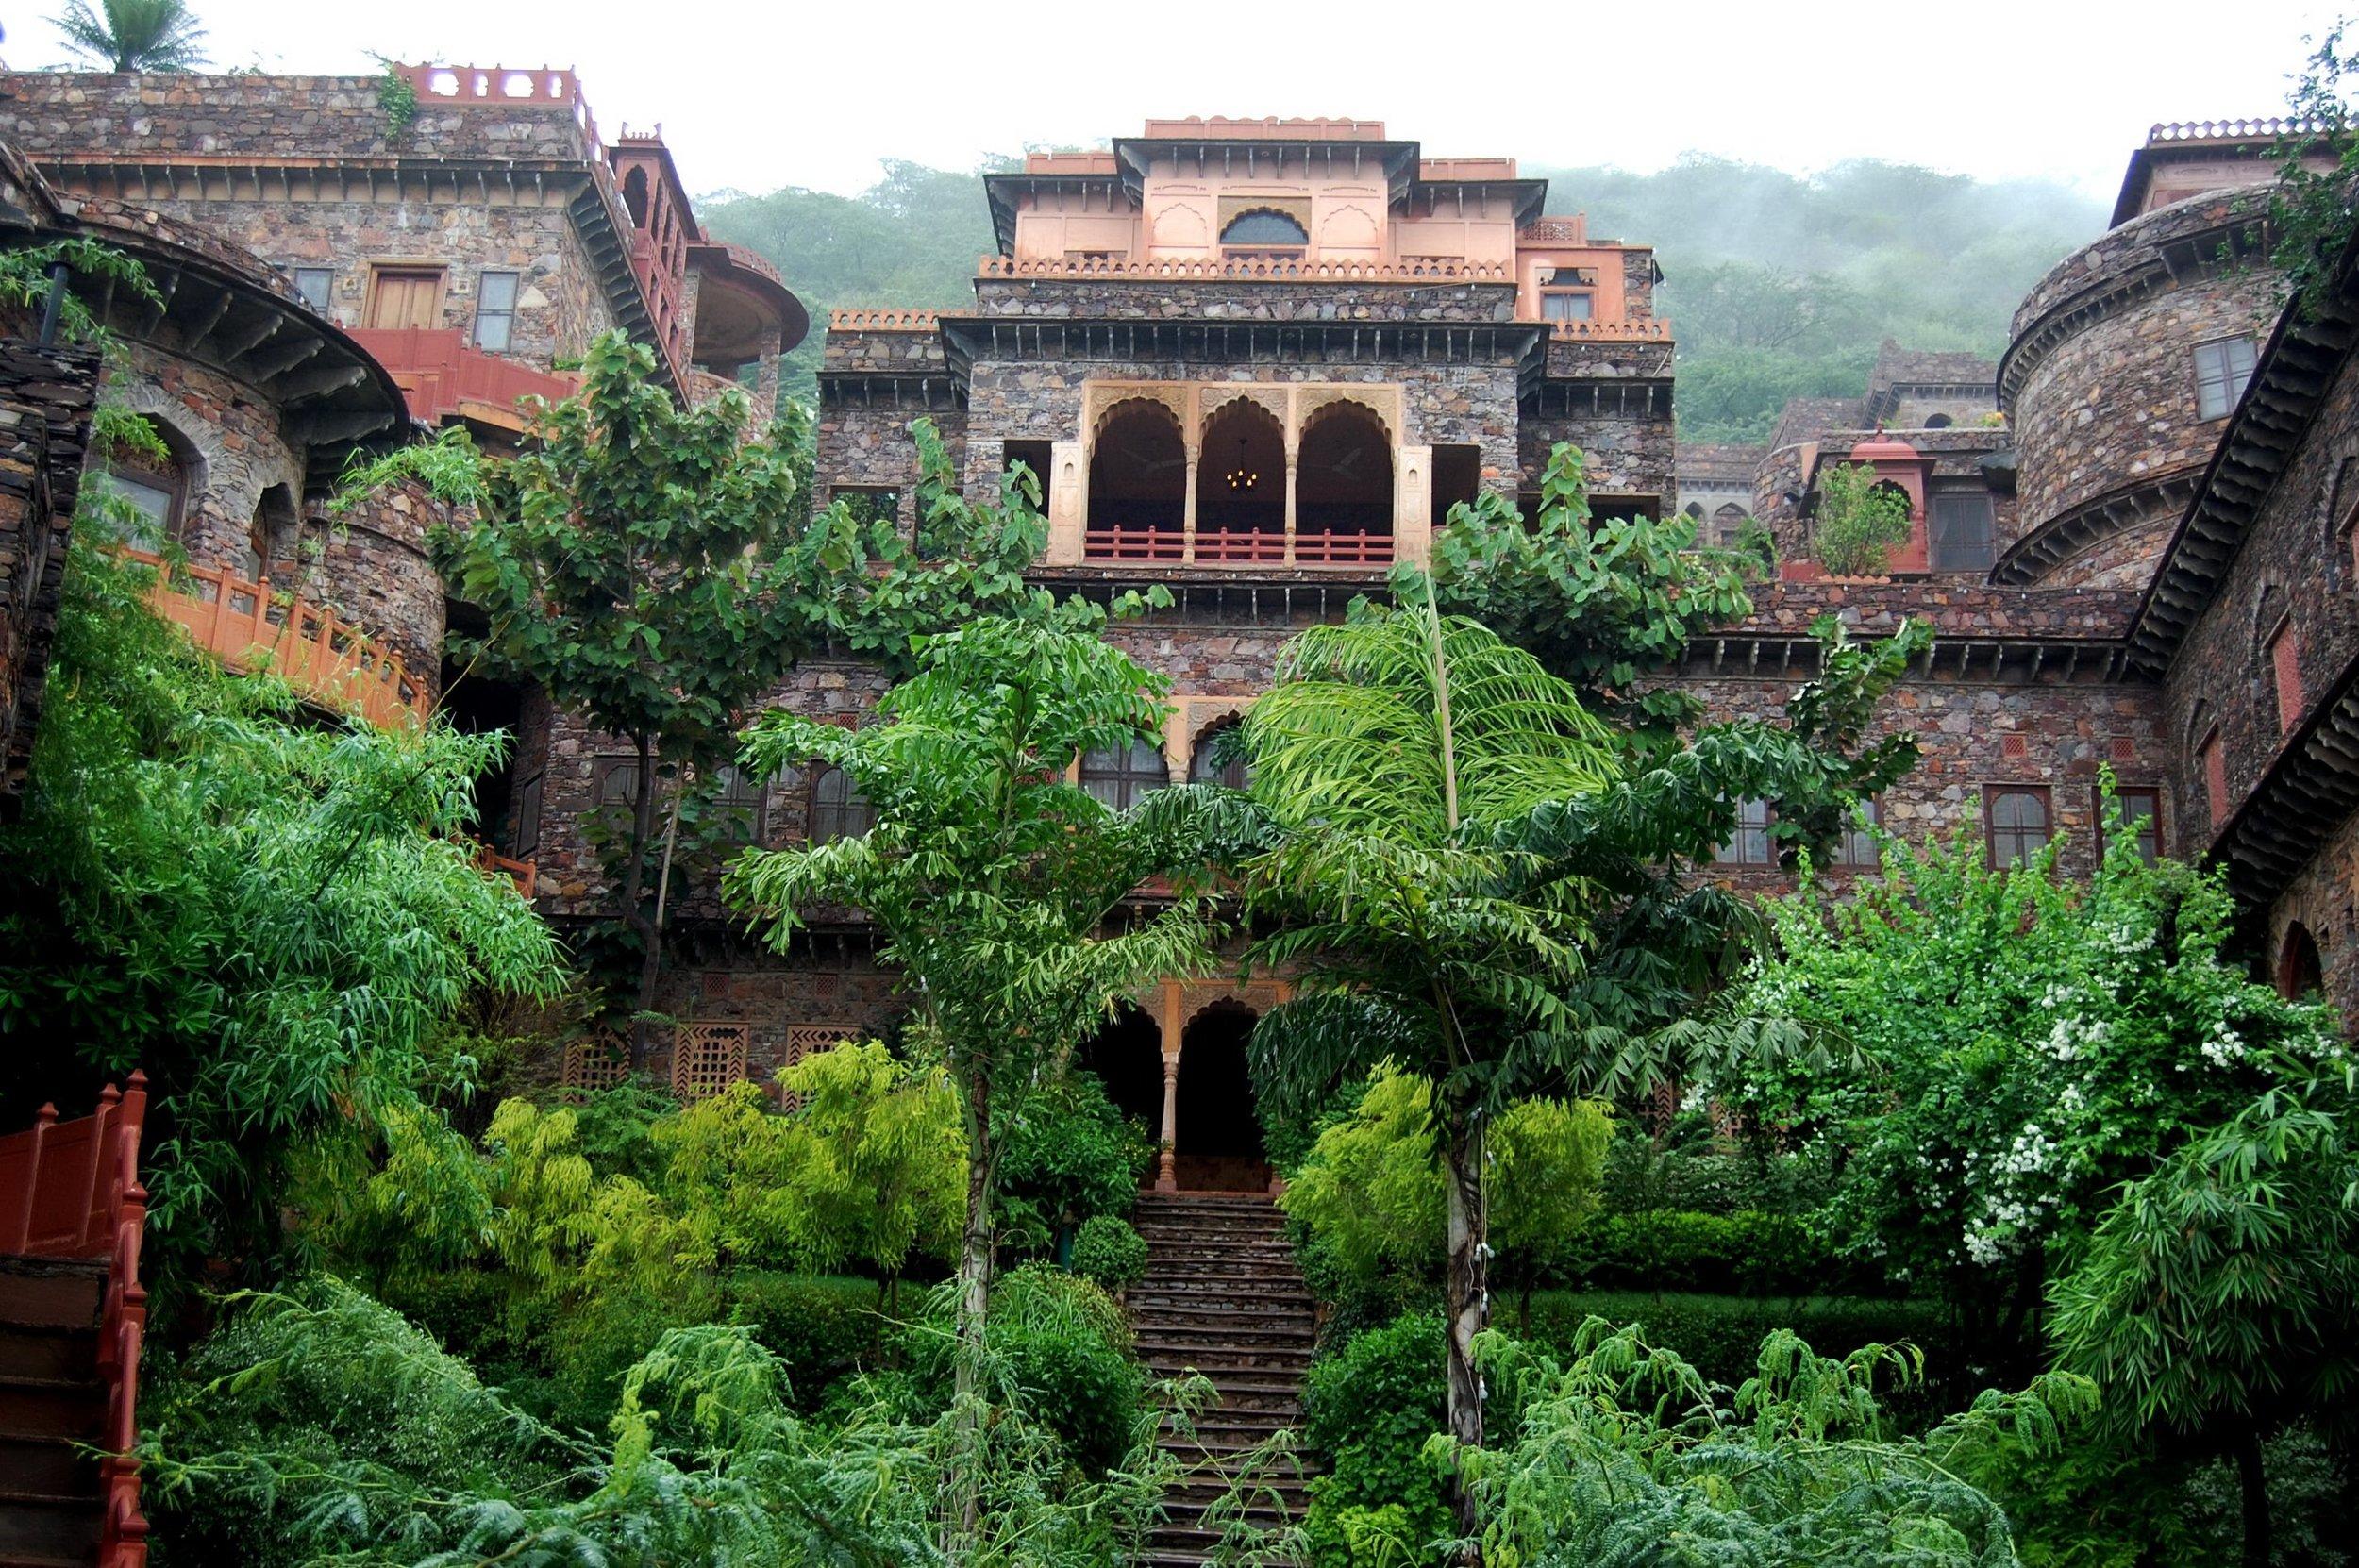 neemrana-fort-palace-rajasthan.jpg